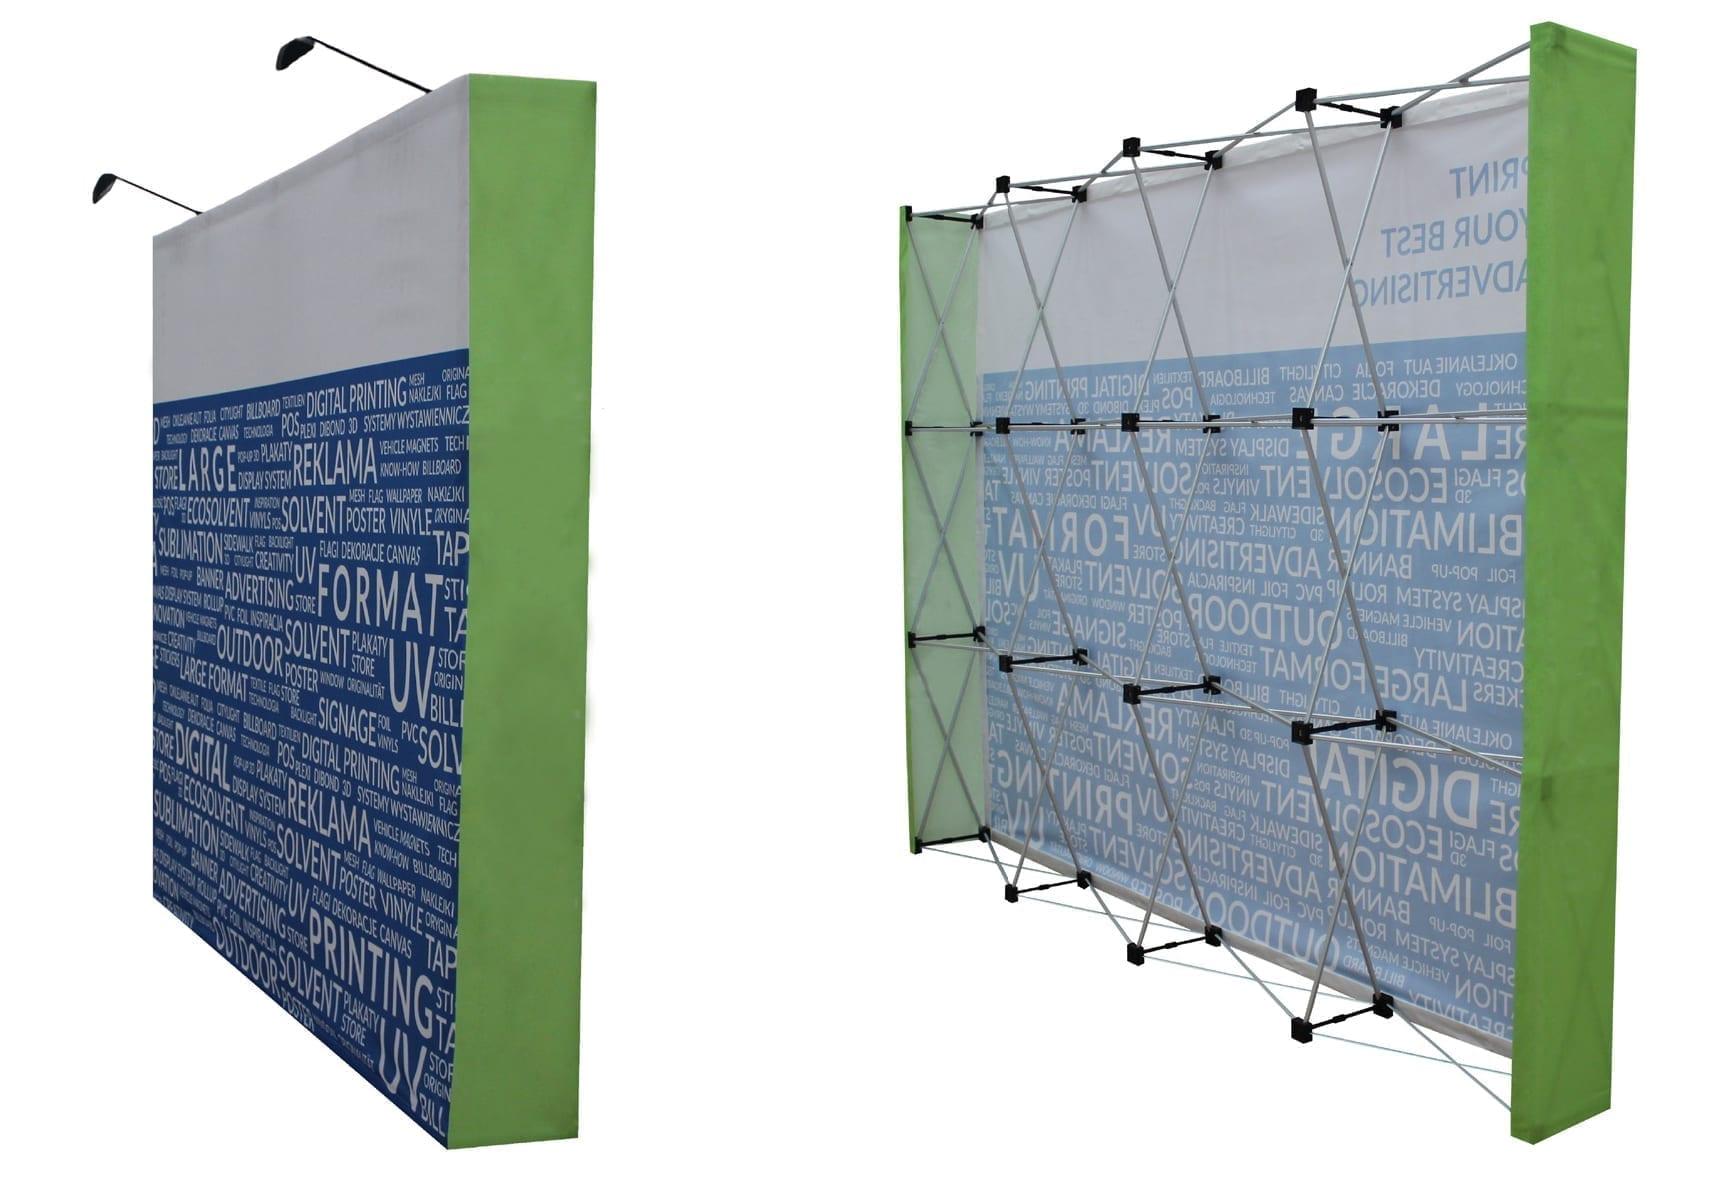 Messevegg - Allprofil AS - Trykksaker - Profilering - Klær - Digital skilting - Tjenester - Kontakt